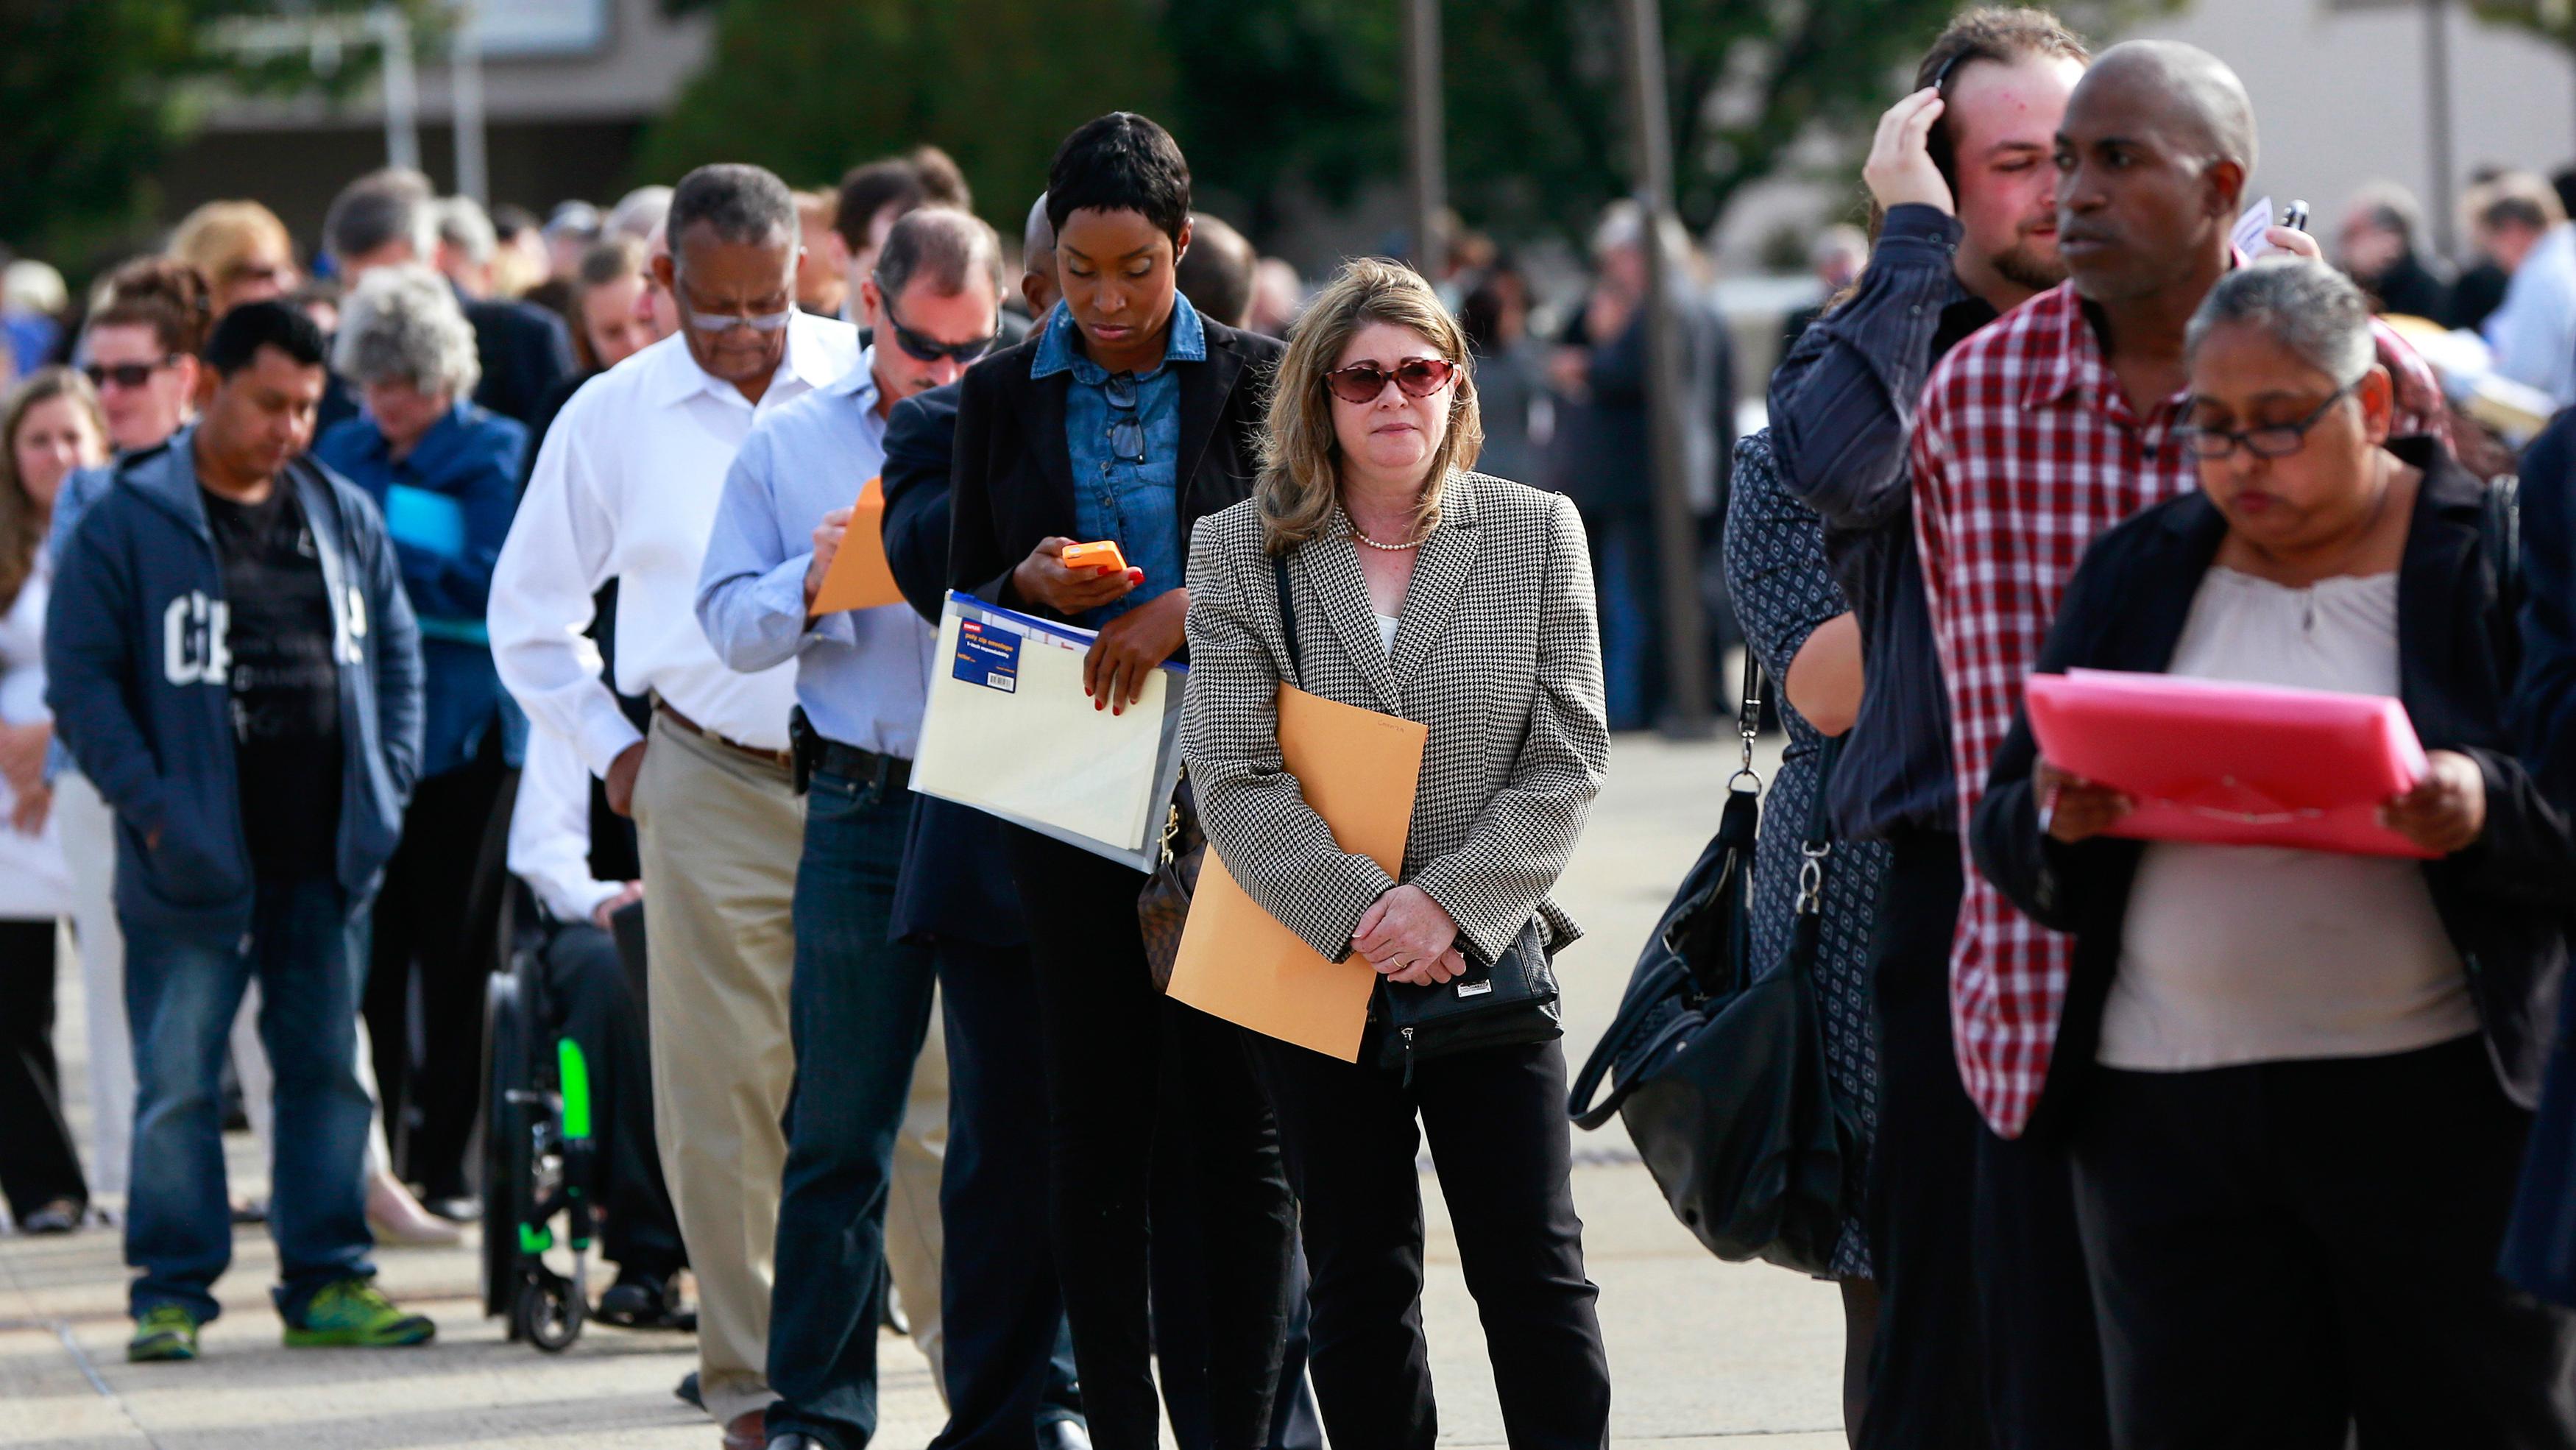 us-unemployment-employment-job-market-wages-labor-work-fed-federal-reserve